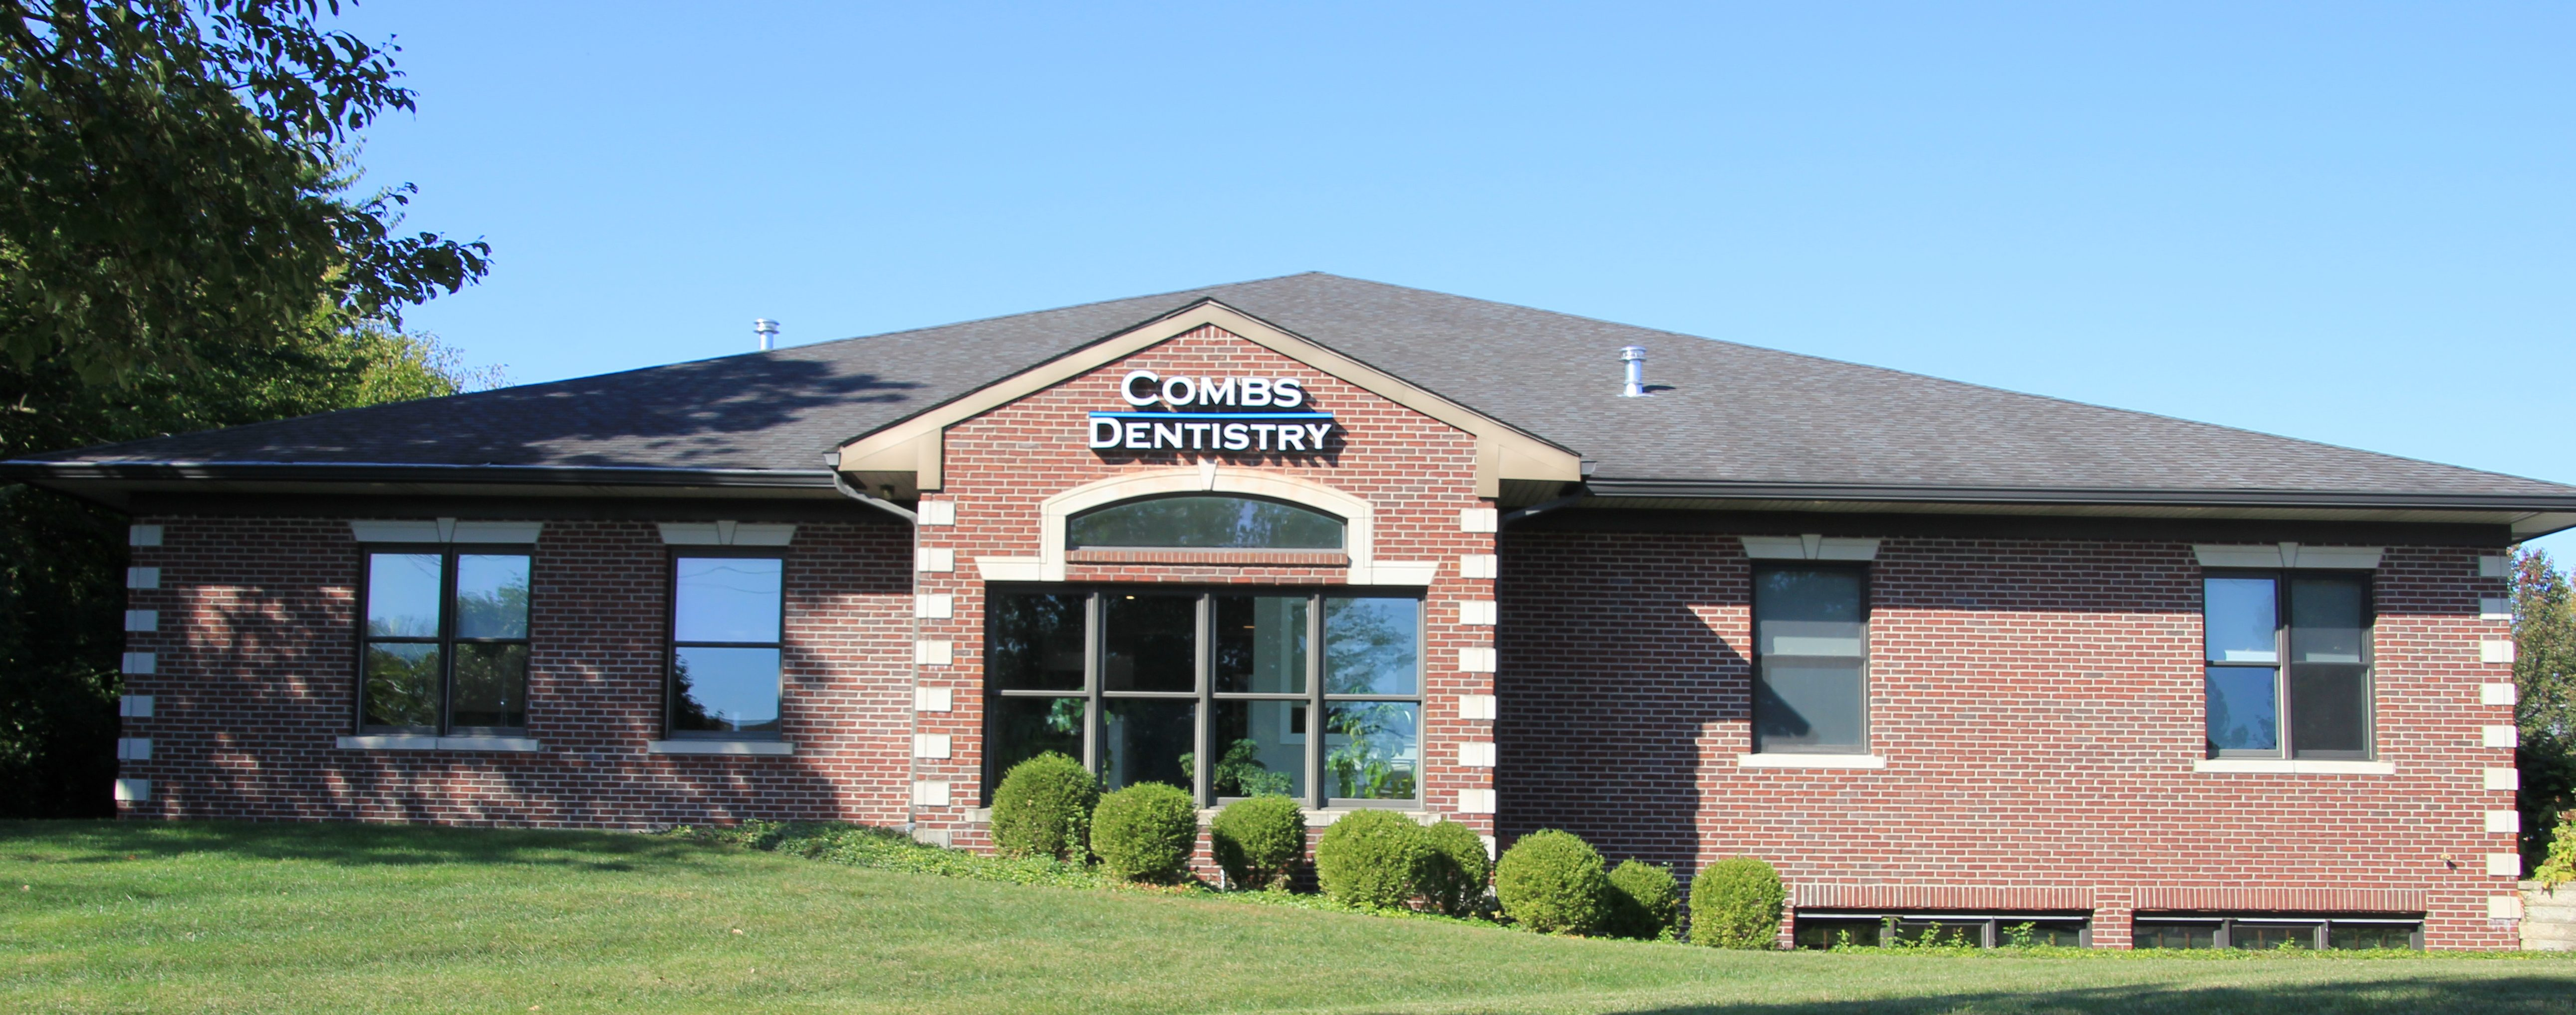 Darrin R Combs DMD | Zionsville Family Dentist